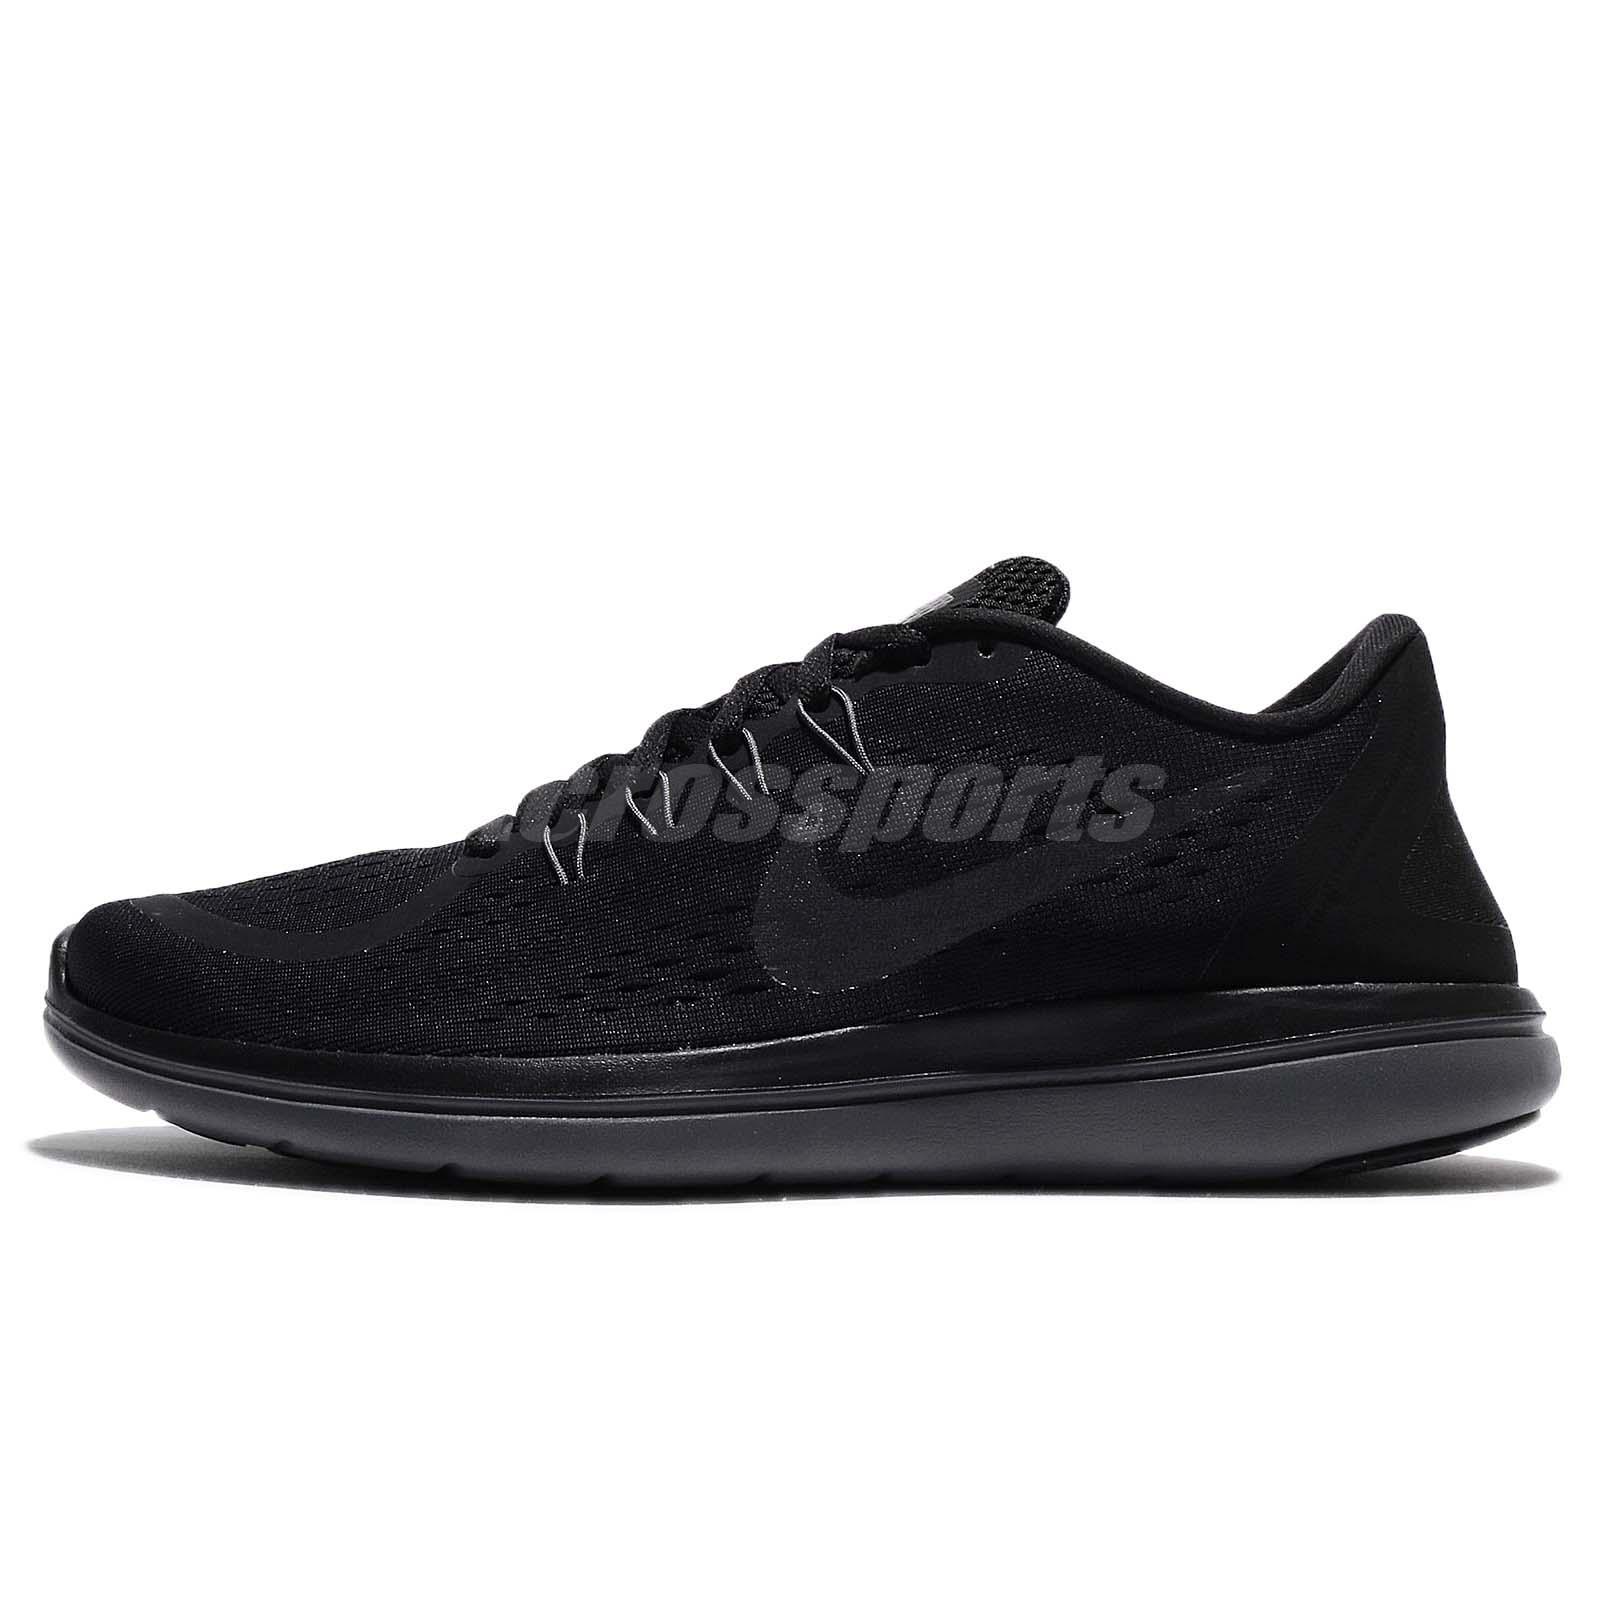 9ff8ce842a1c Nike Flex 2017 RN Run Black Men Running Shoes Sneakers 898457-005